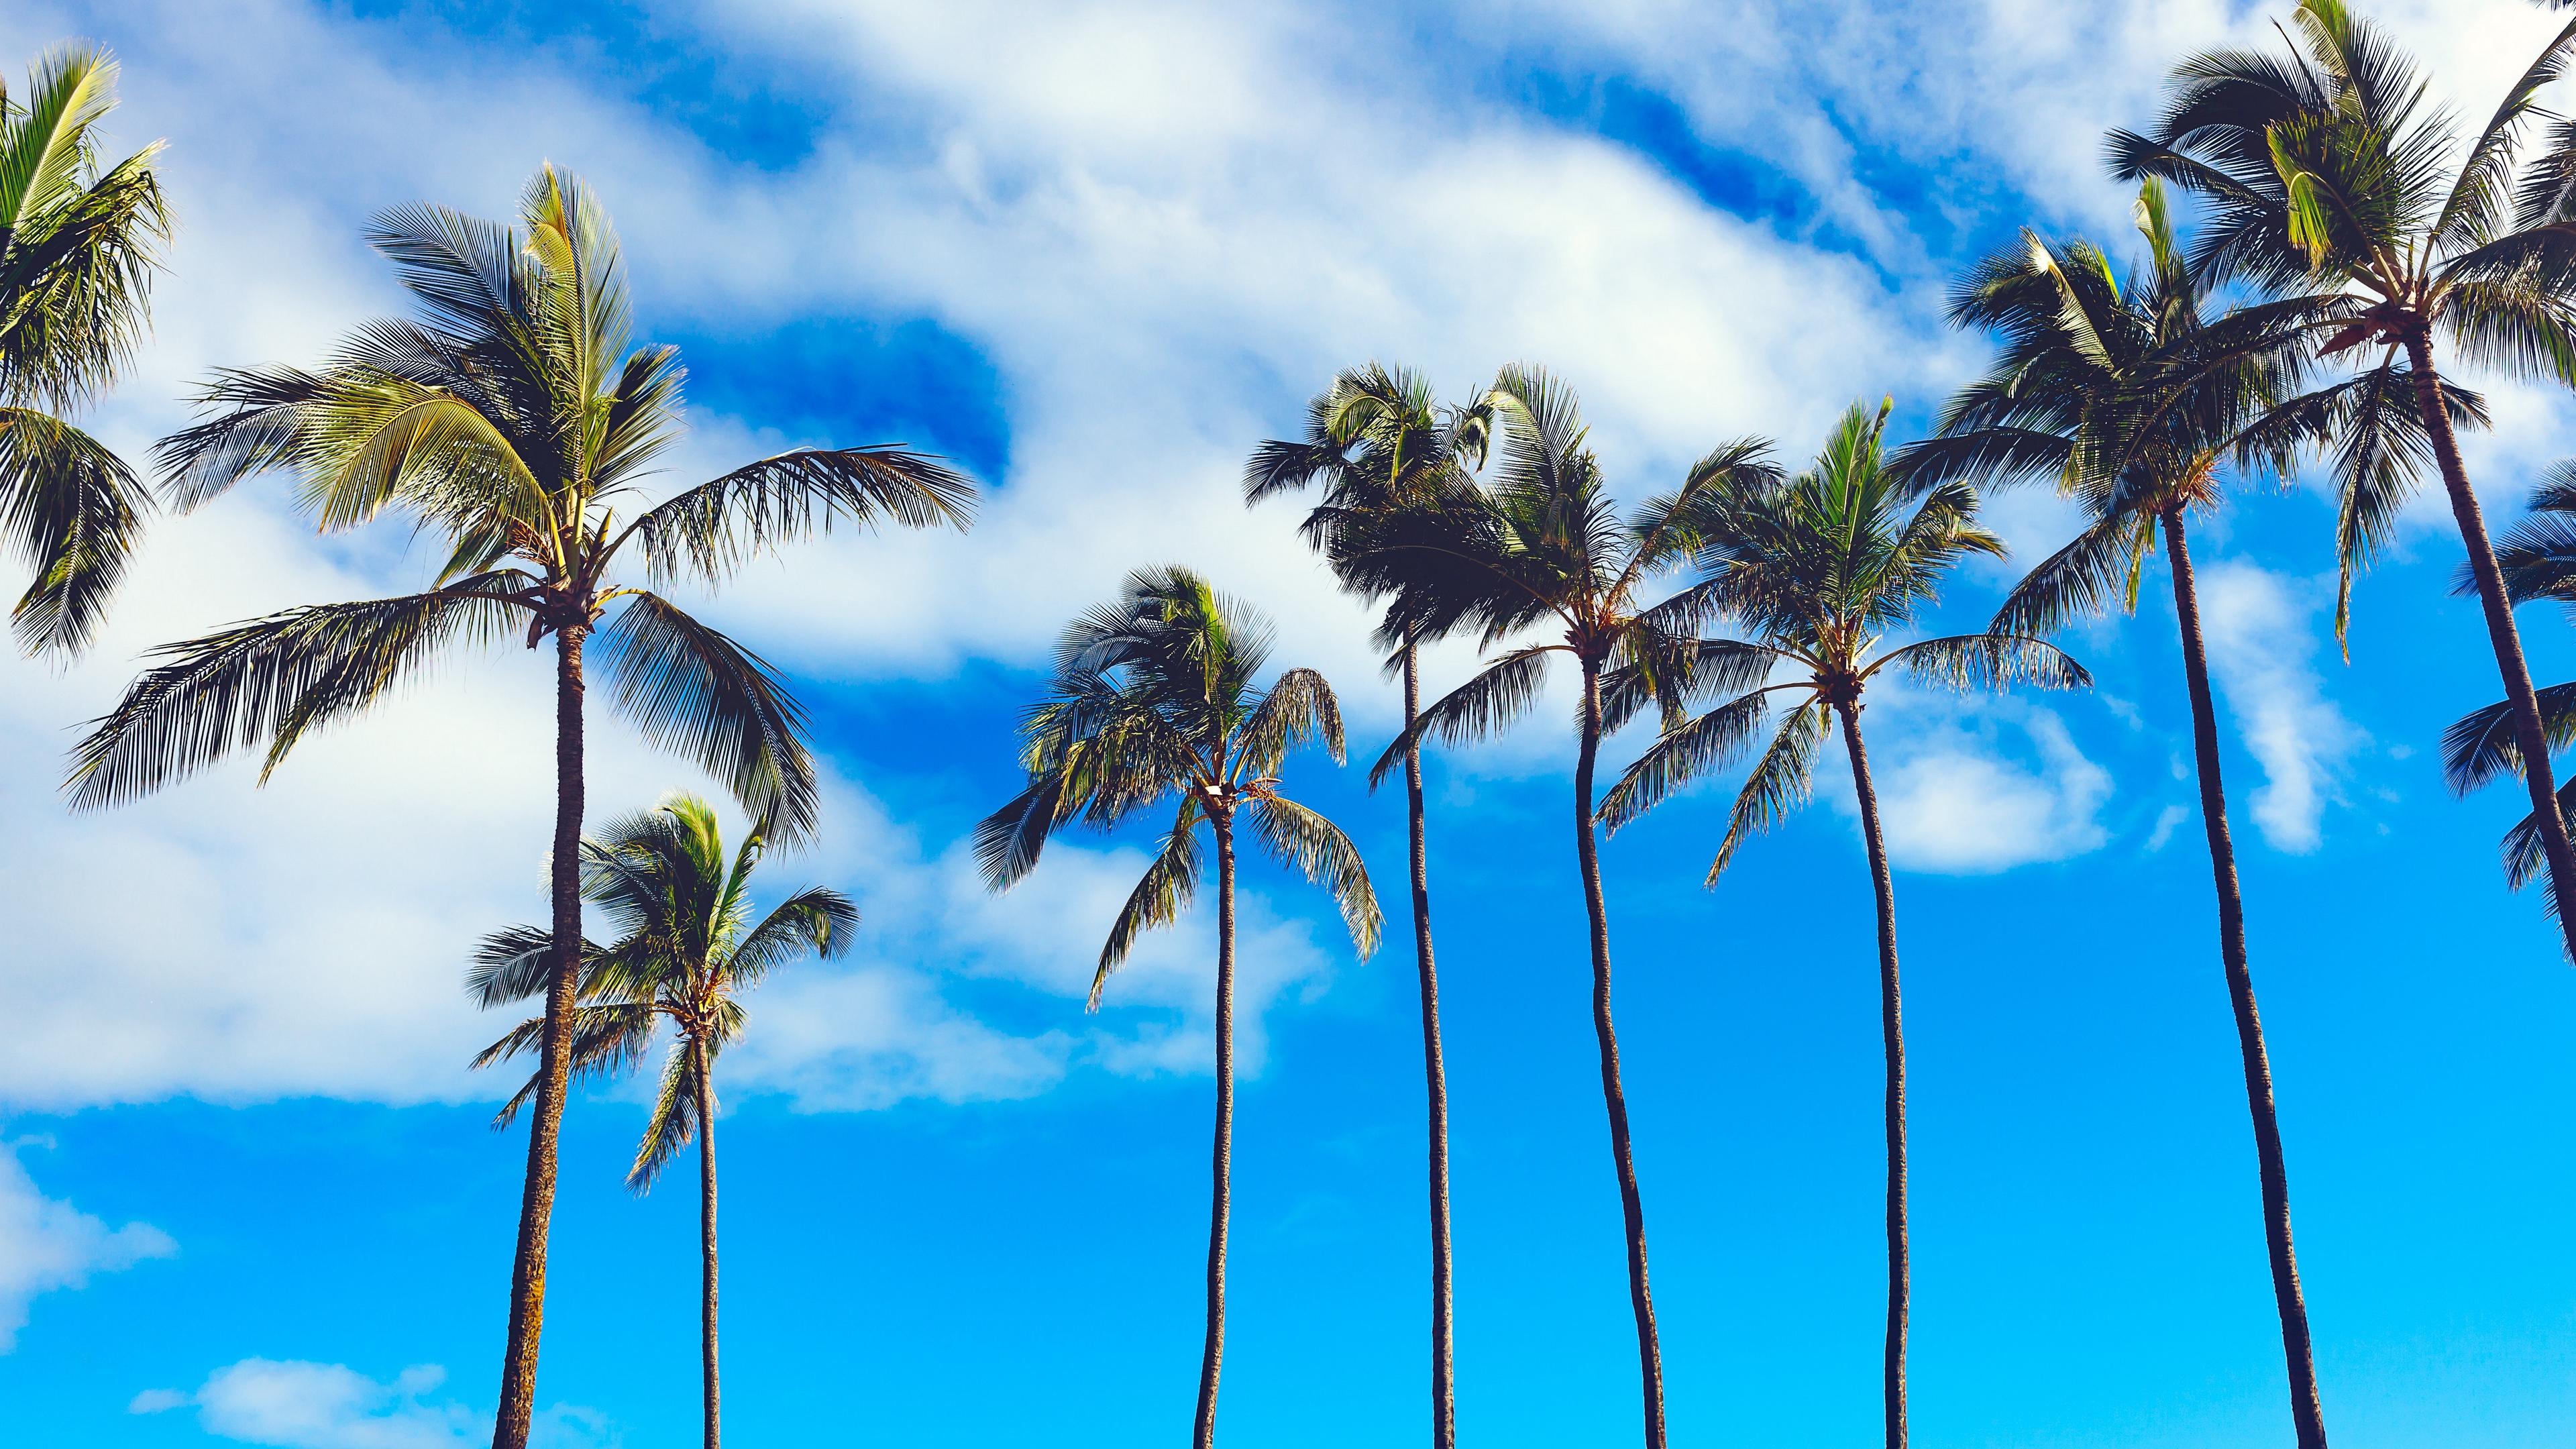 palms trees summer sky 4k 1541117794 - palms, trees, summer, sky 4k - Trees, Summer, palms